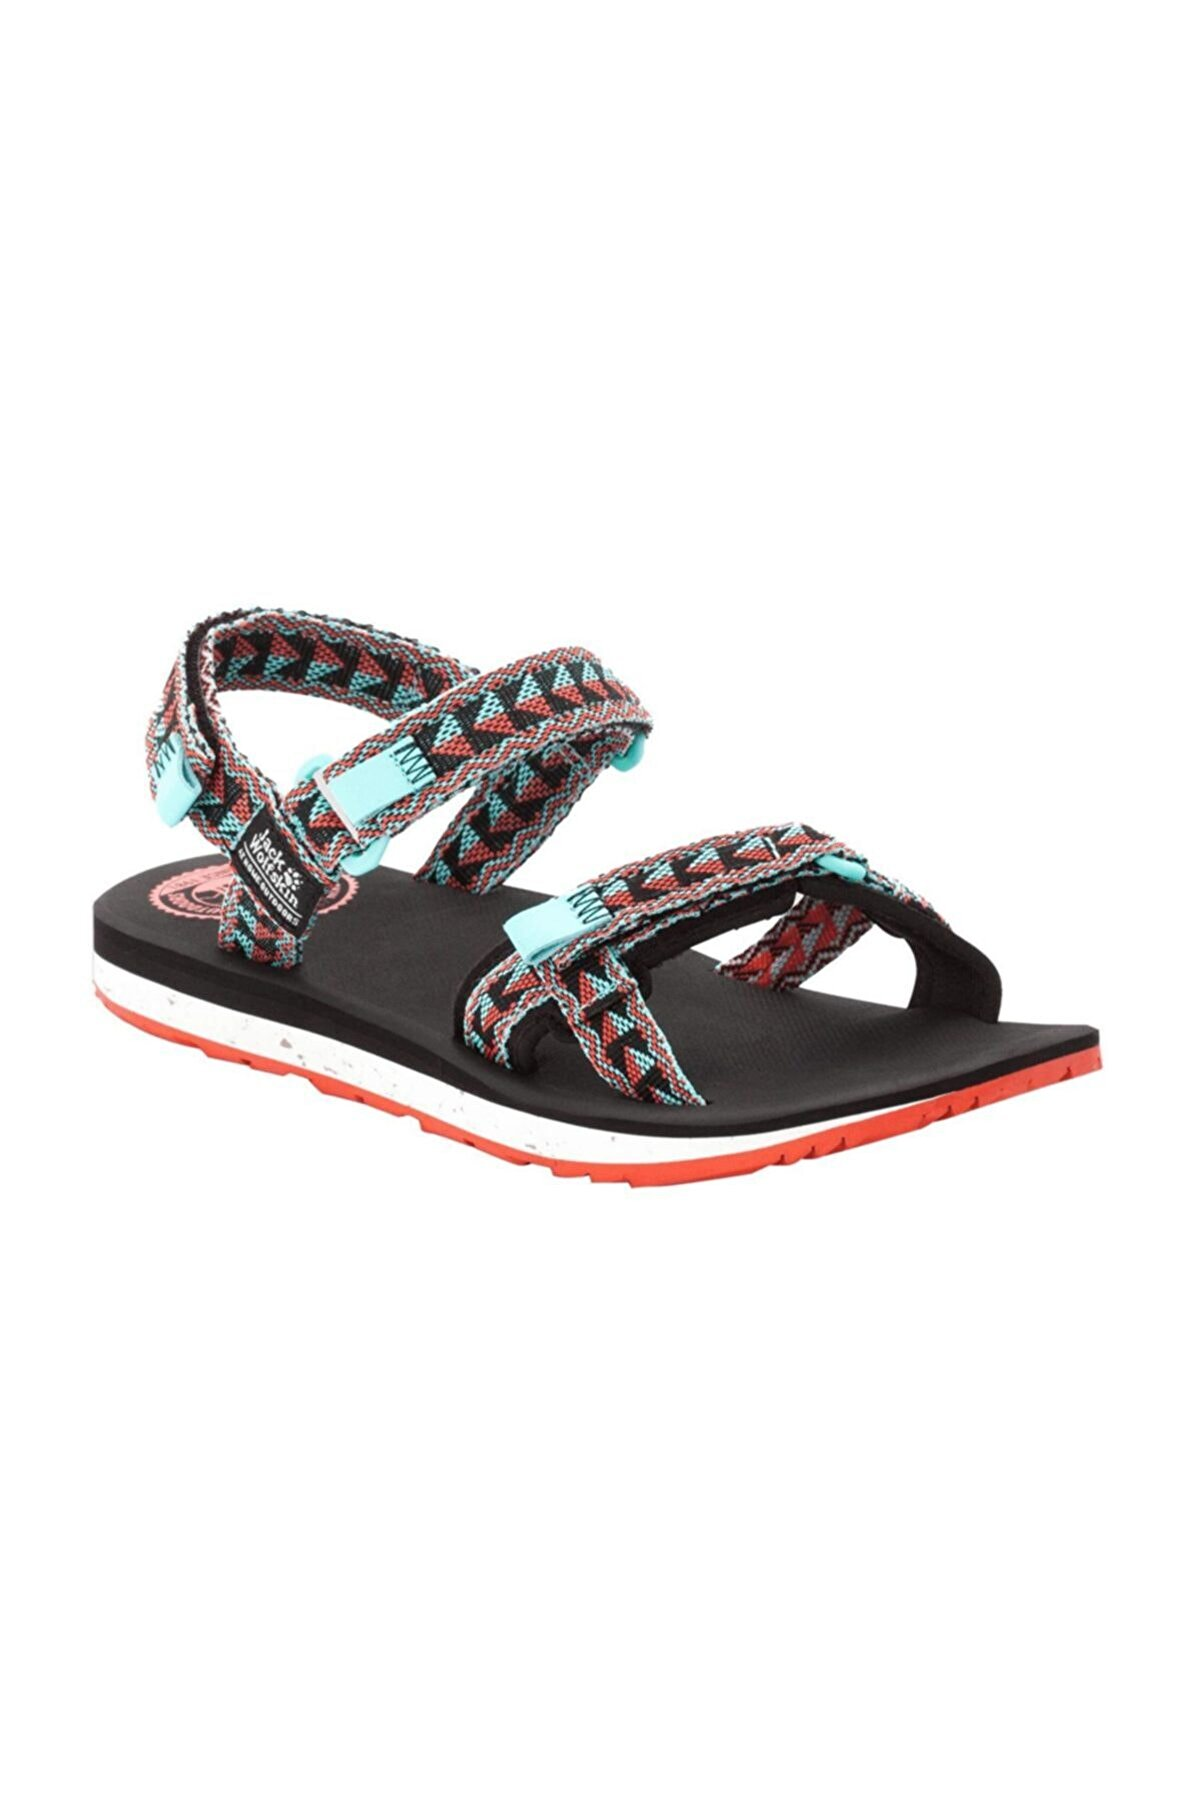 Jack Wolfskin Outfresh Kadın Sandalet 4039461-6089-23900